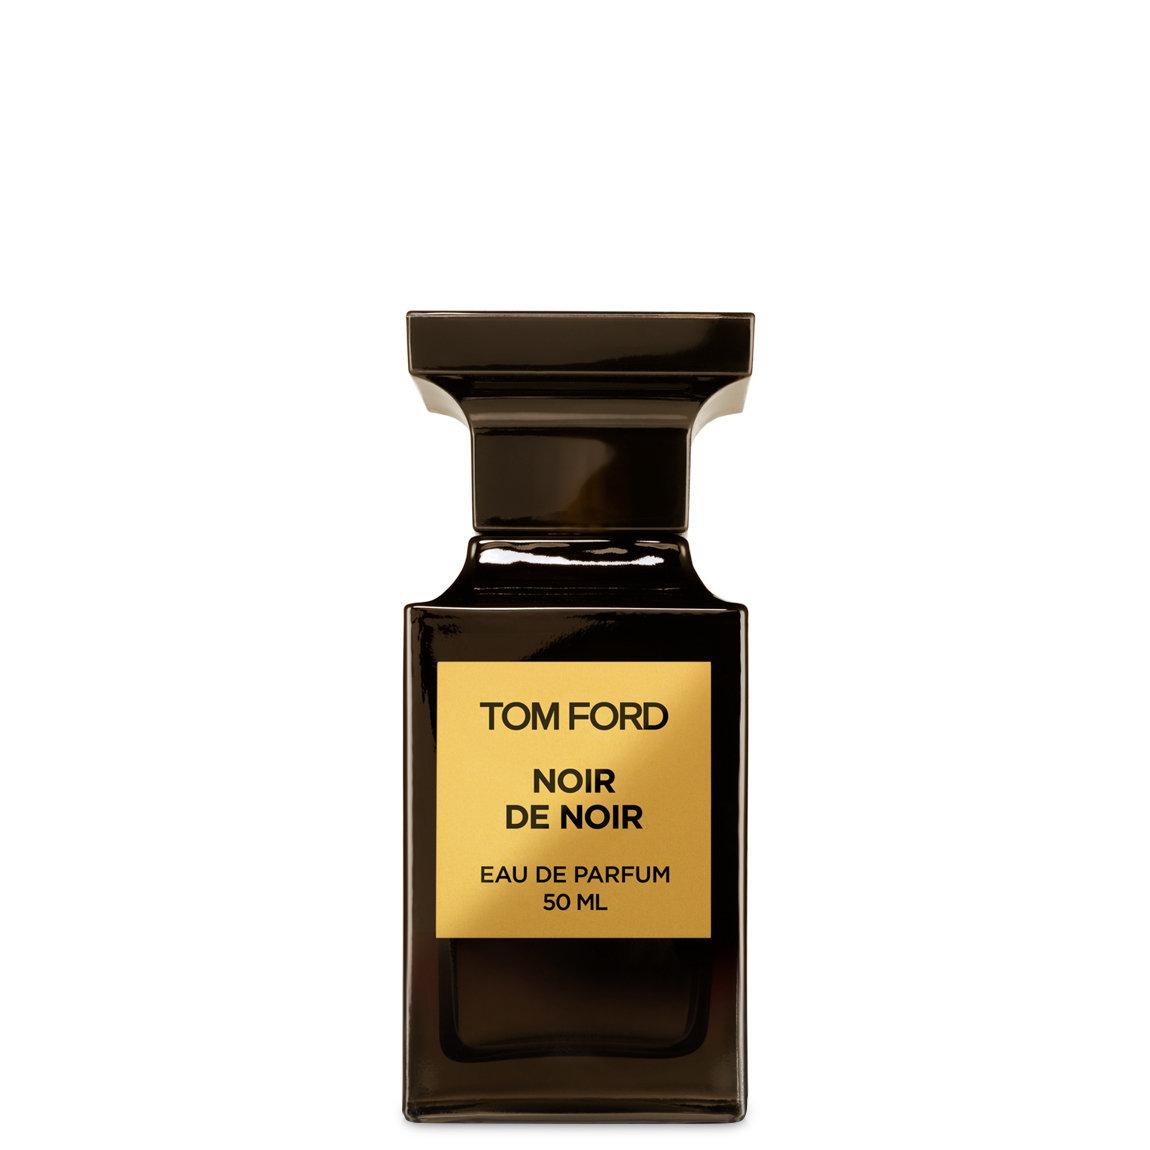 TOM FORD Noir de Noir 50 ml alternative view 1 - product swatch.